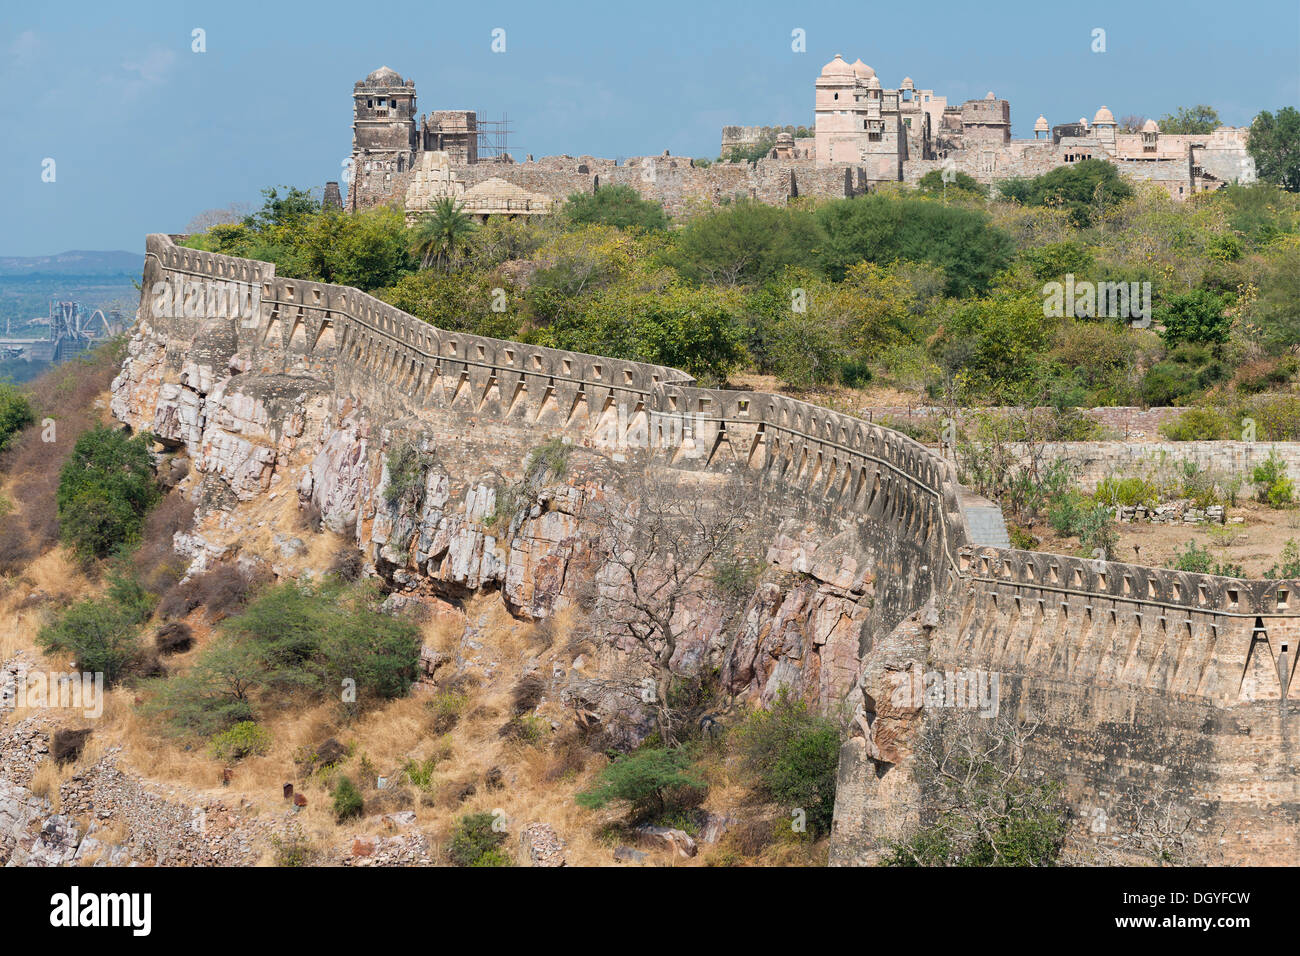 Mura fortificate, Chittorgarh Fort degli Indù Rajput princes, Chittorgarh, Rajasthan, India Immagini Stock